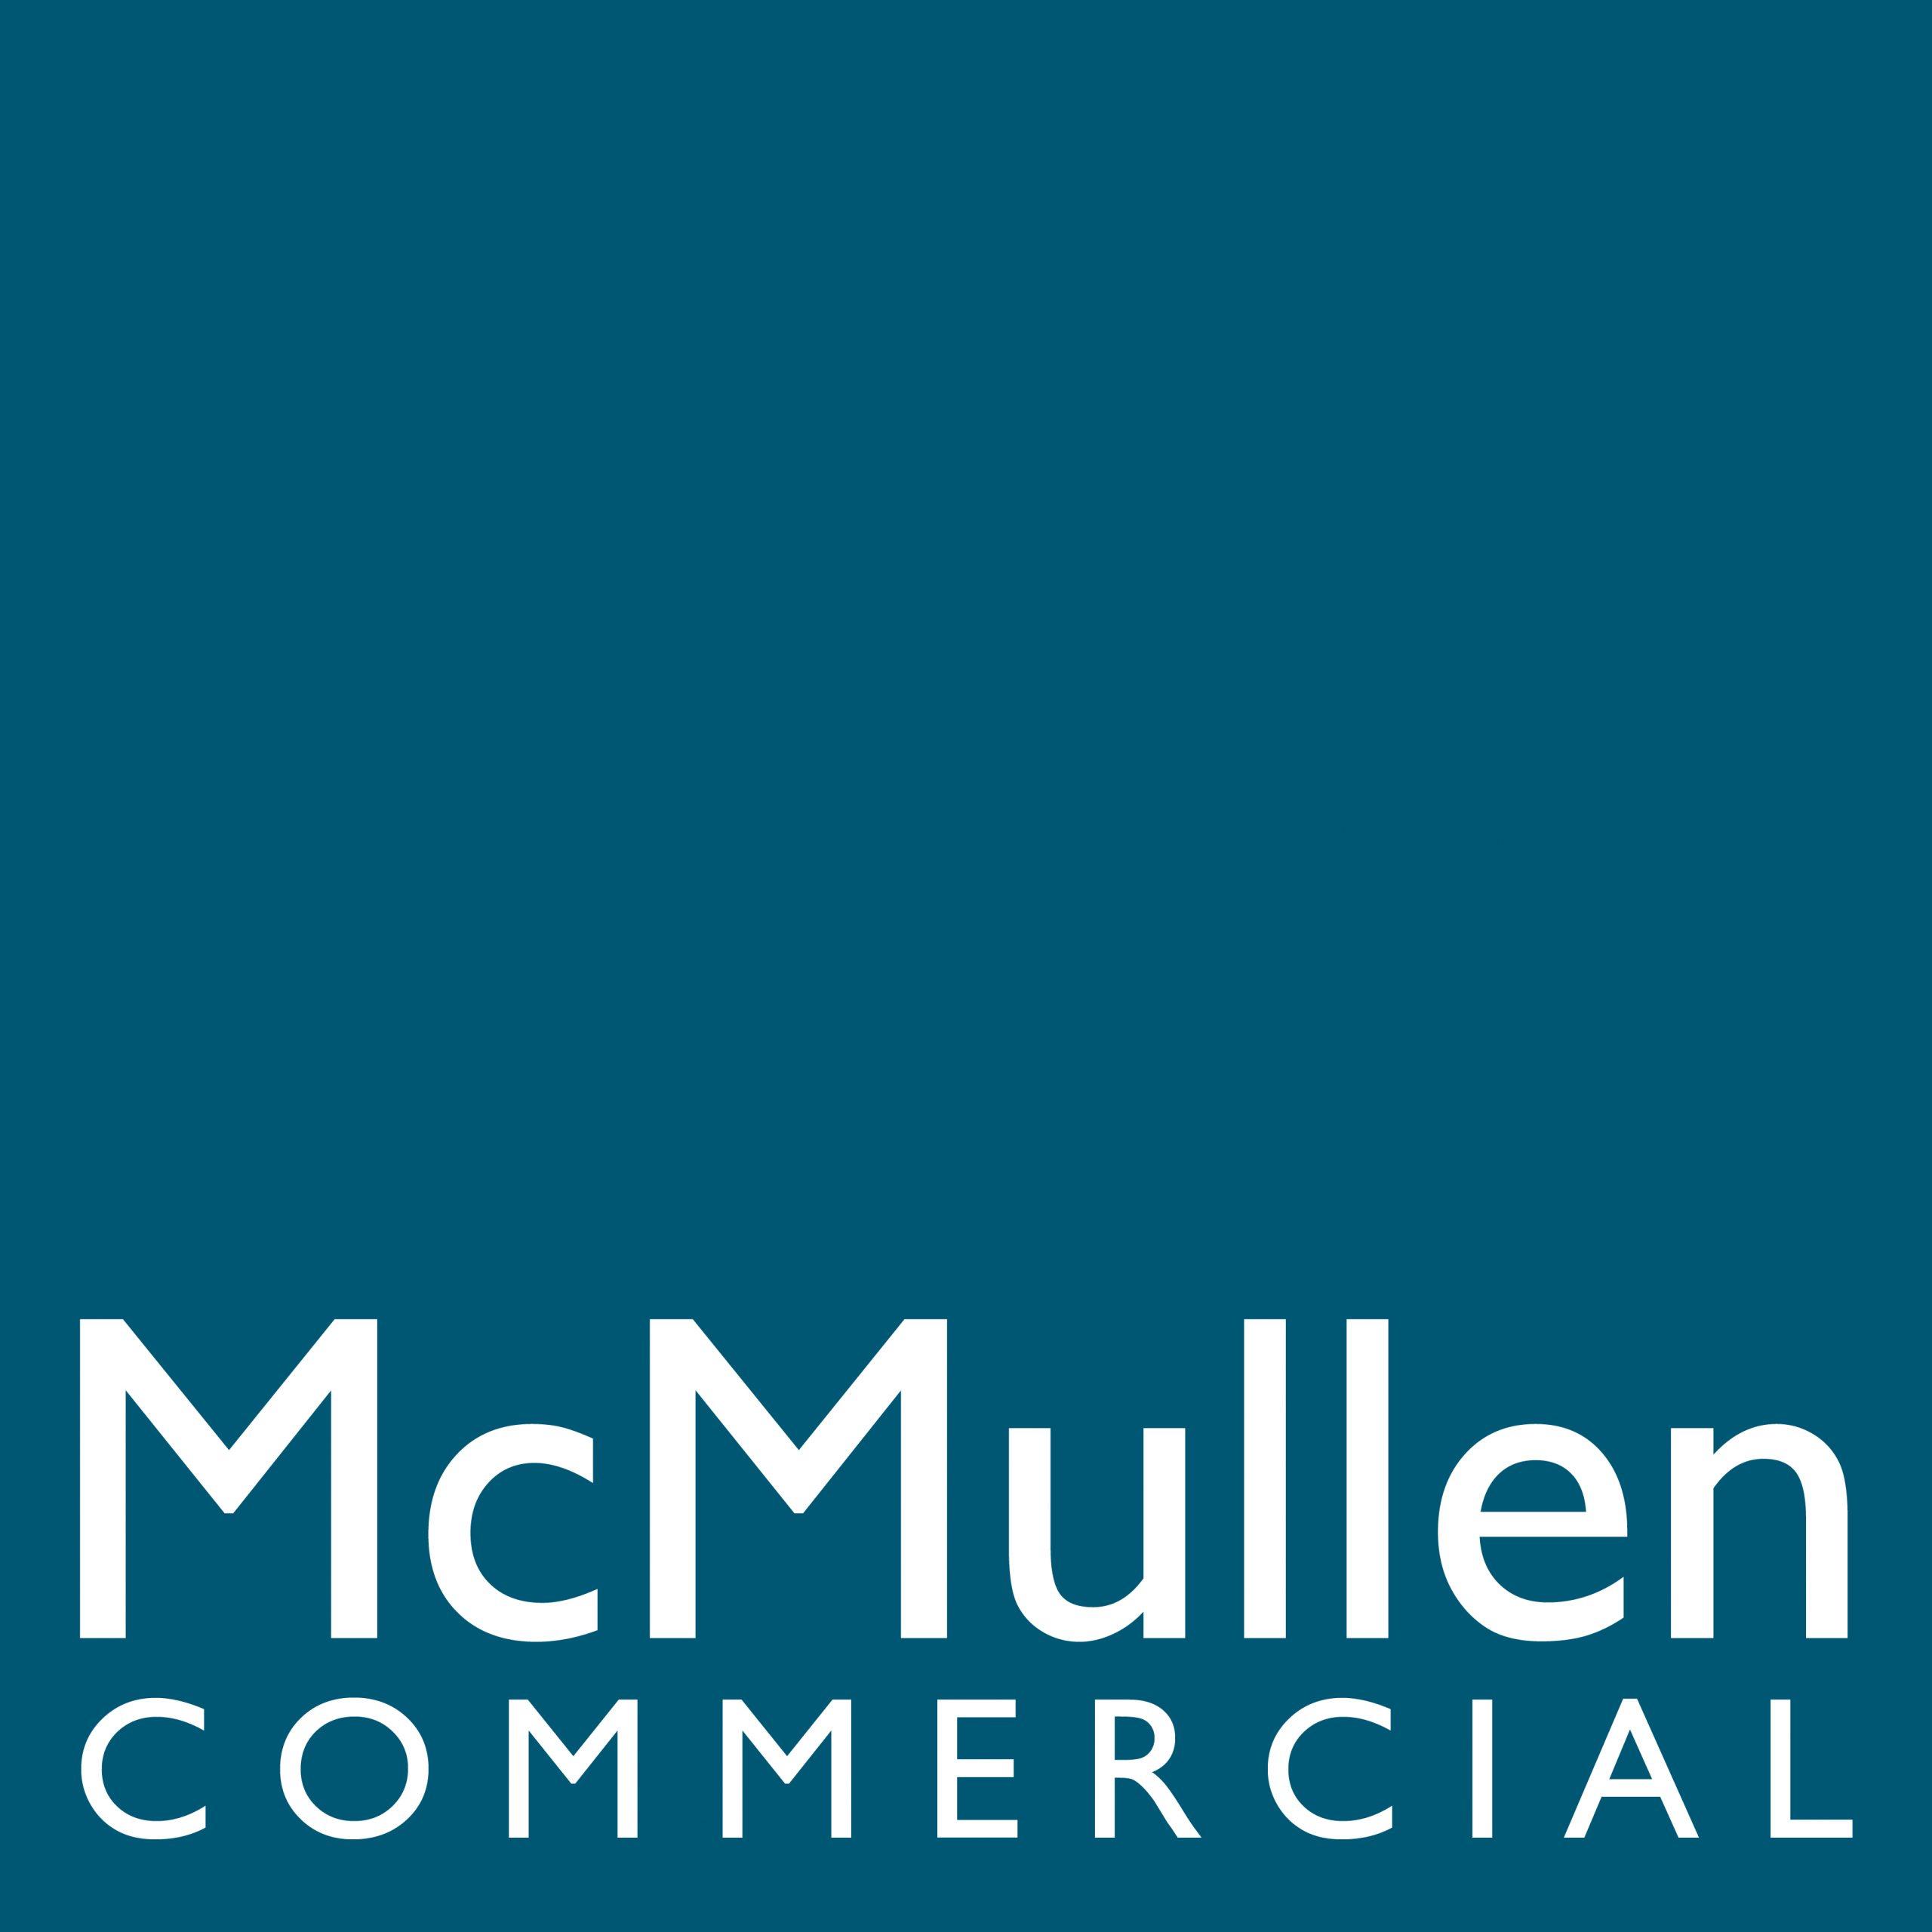 McMullen Commercial